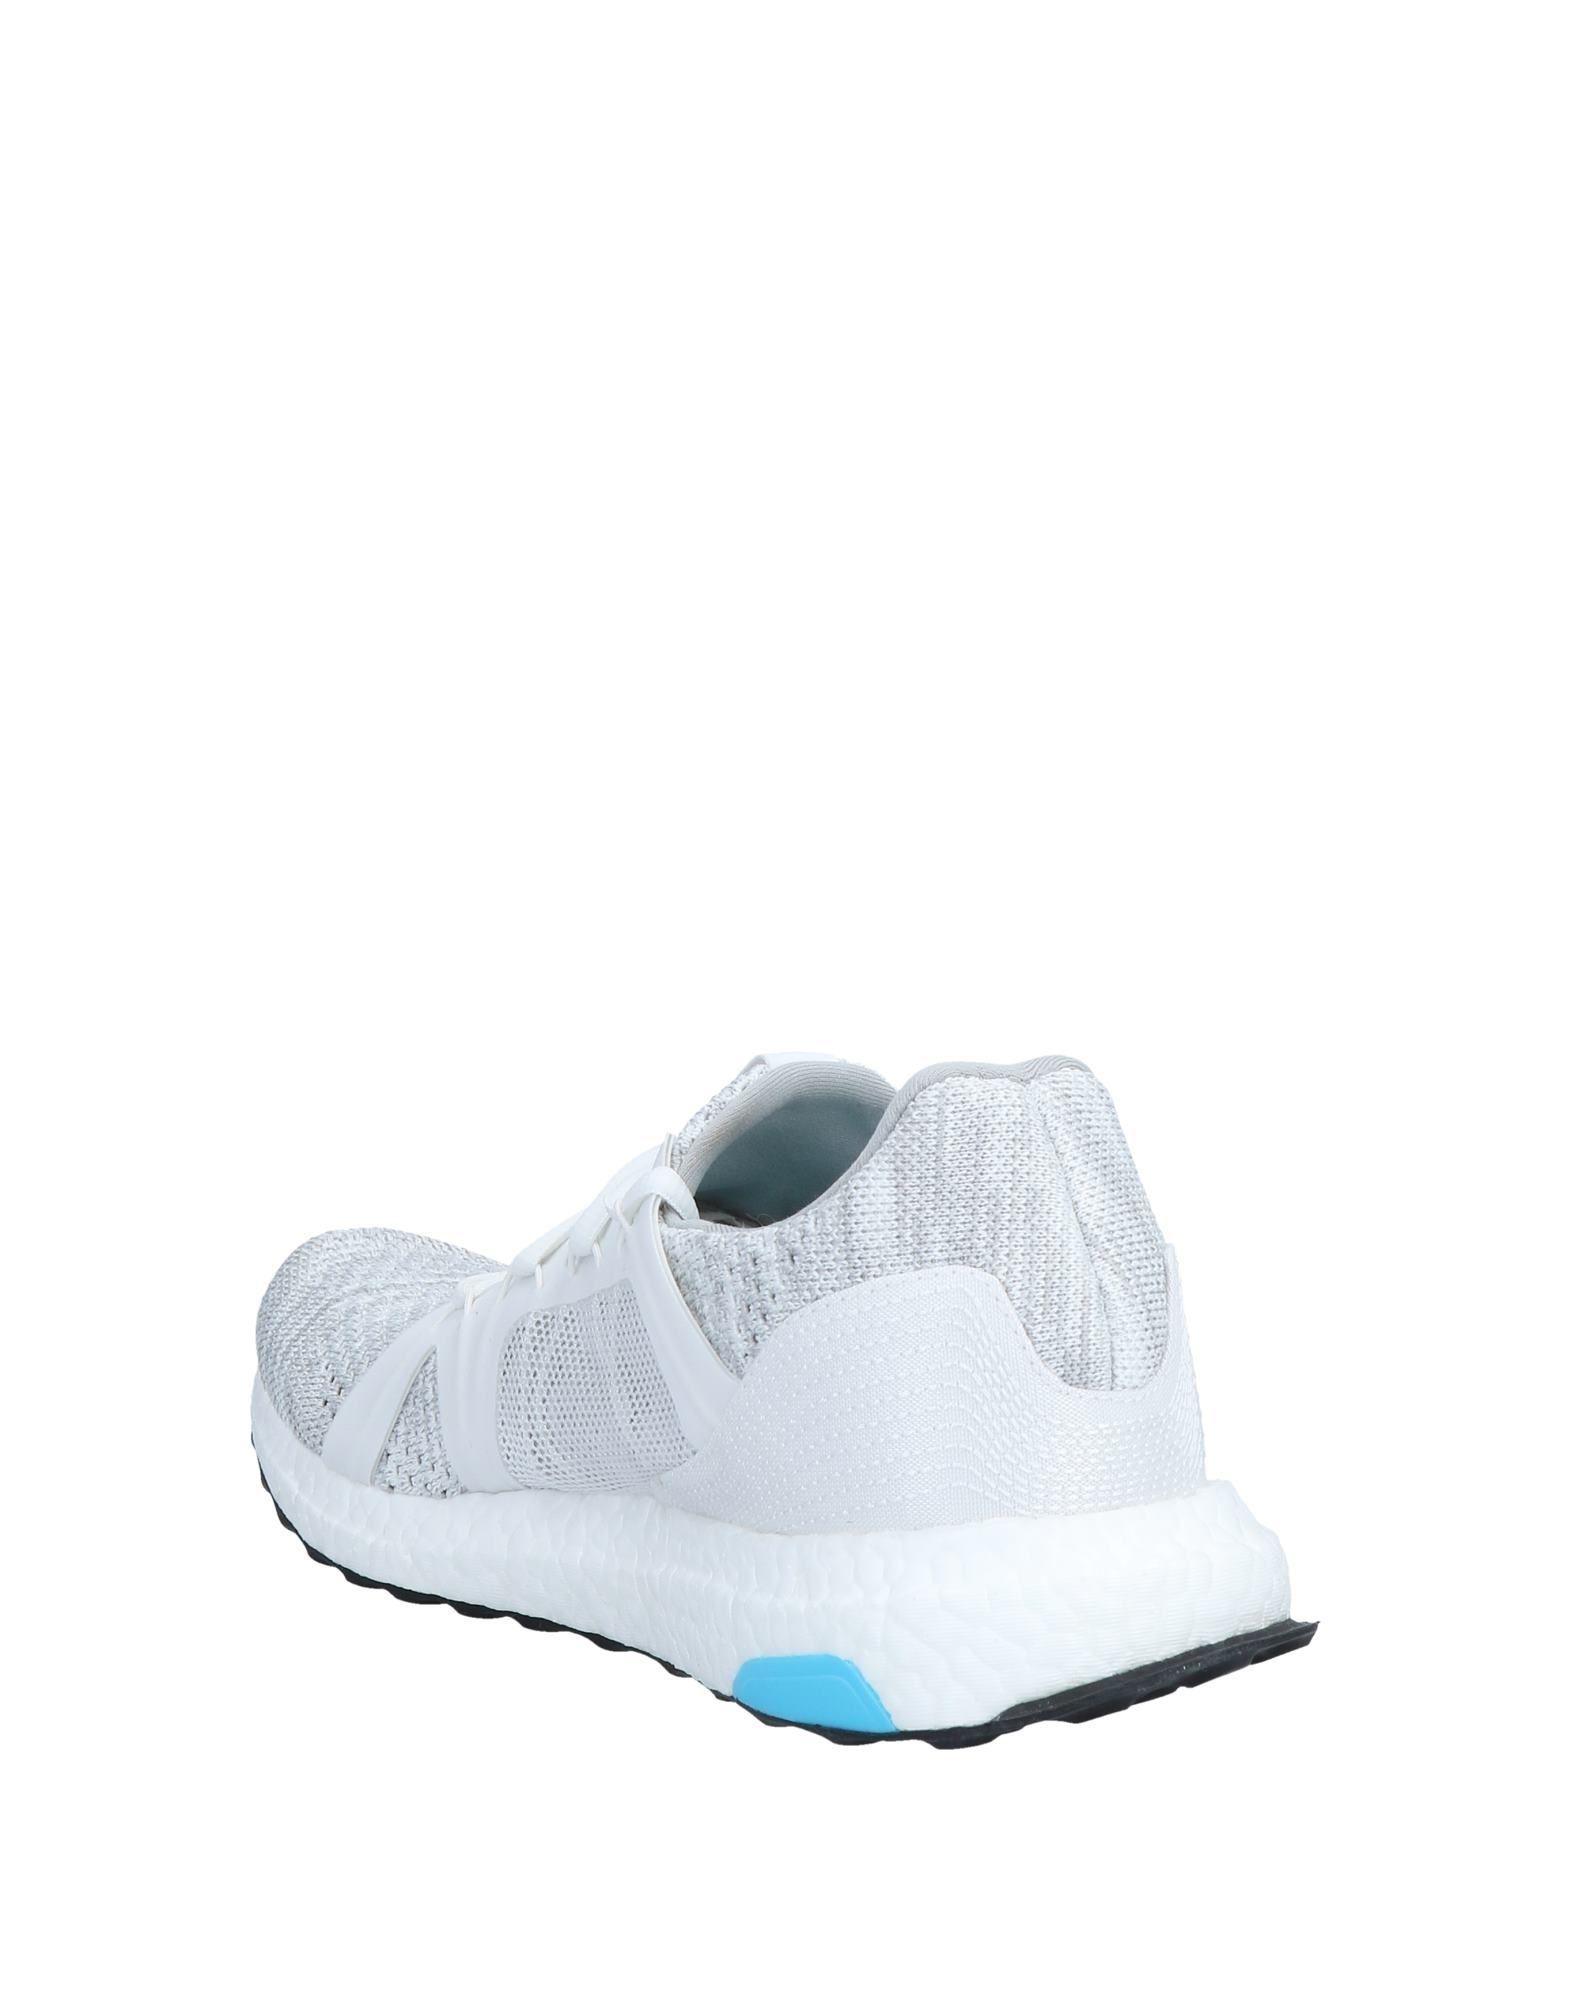 5d9132b49182b Lyst - Sneakers   Tennis basses adidas By Stella McCartney en coloris Blanc